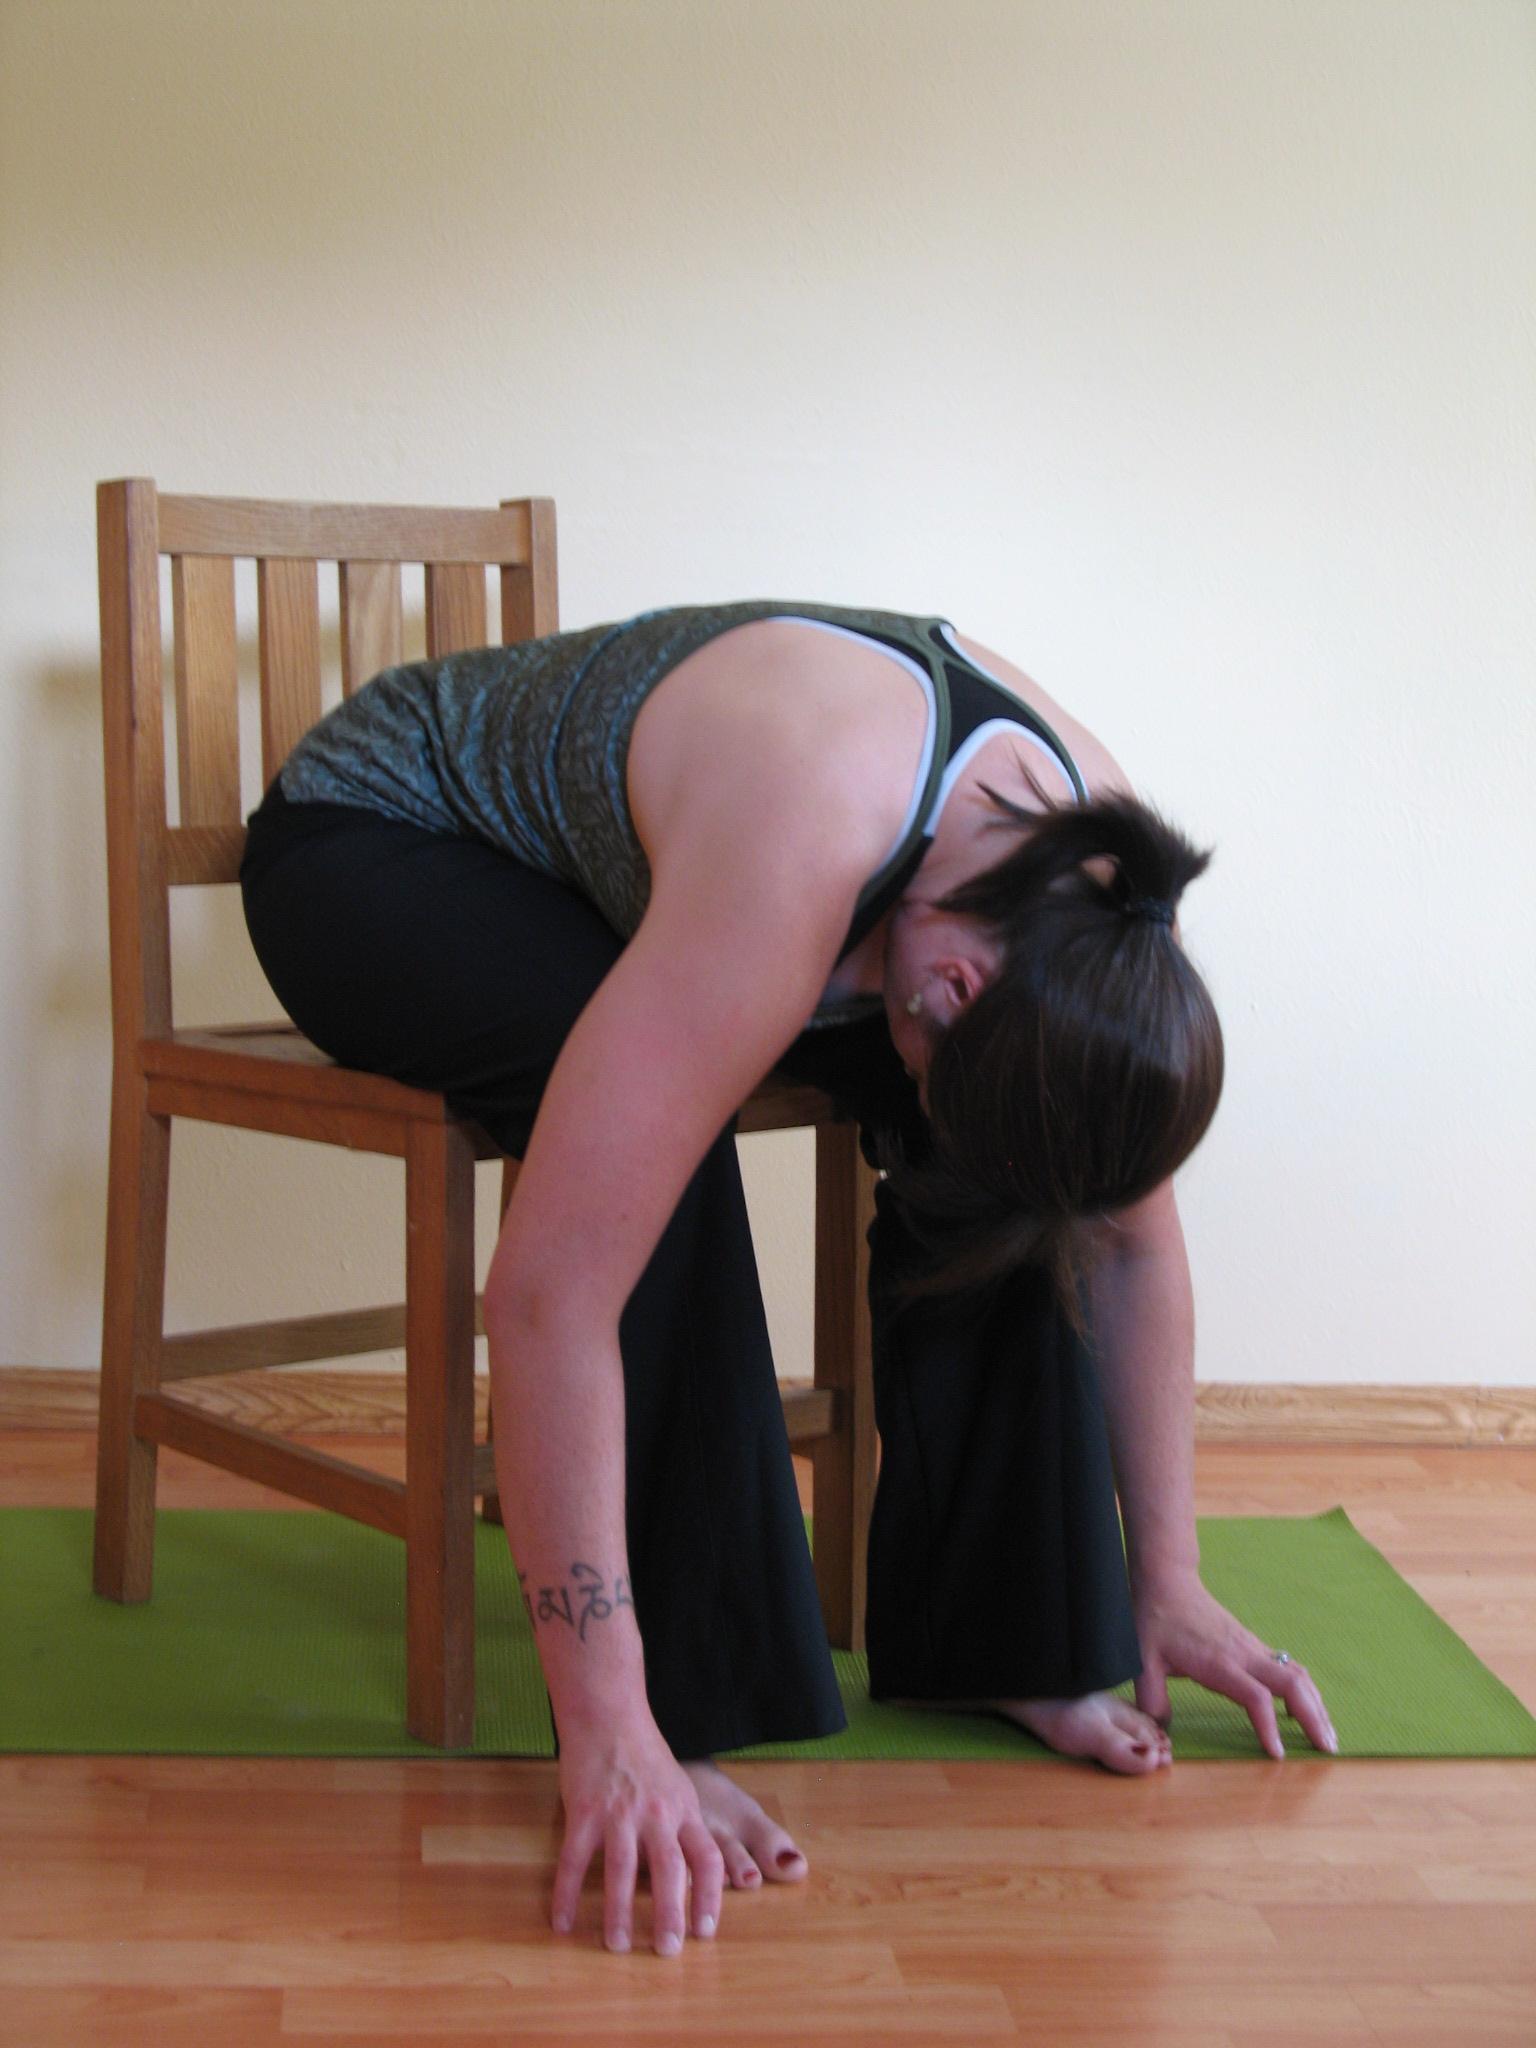 seated chair yoga poses for seniors eames sale zodhana